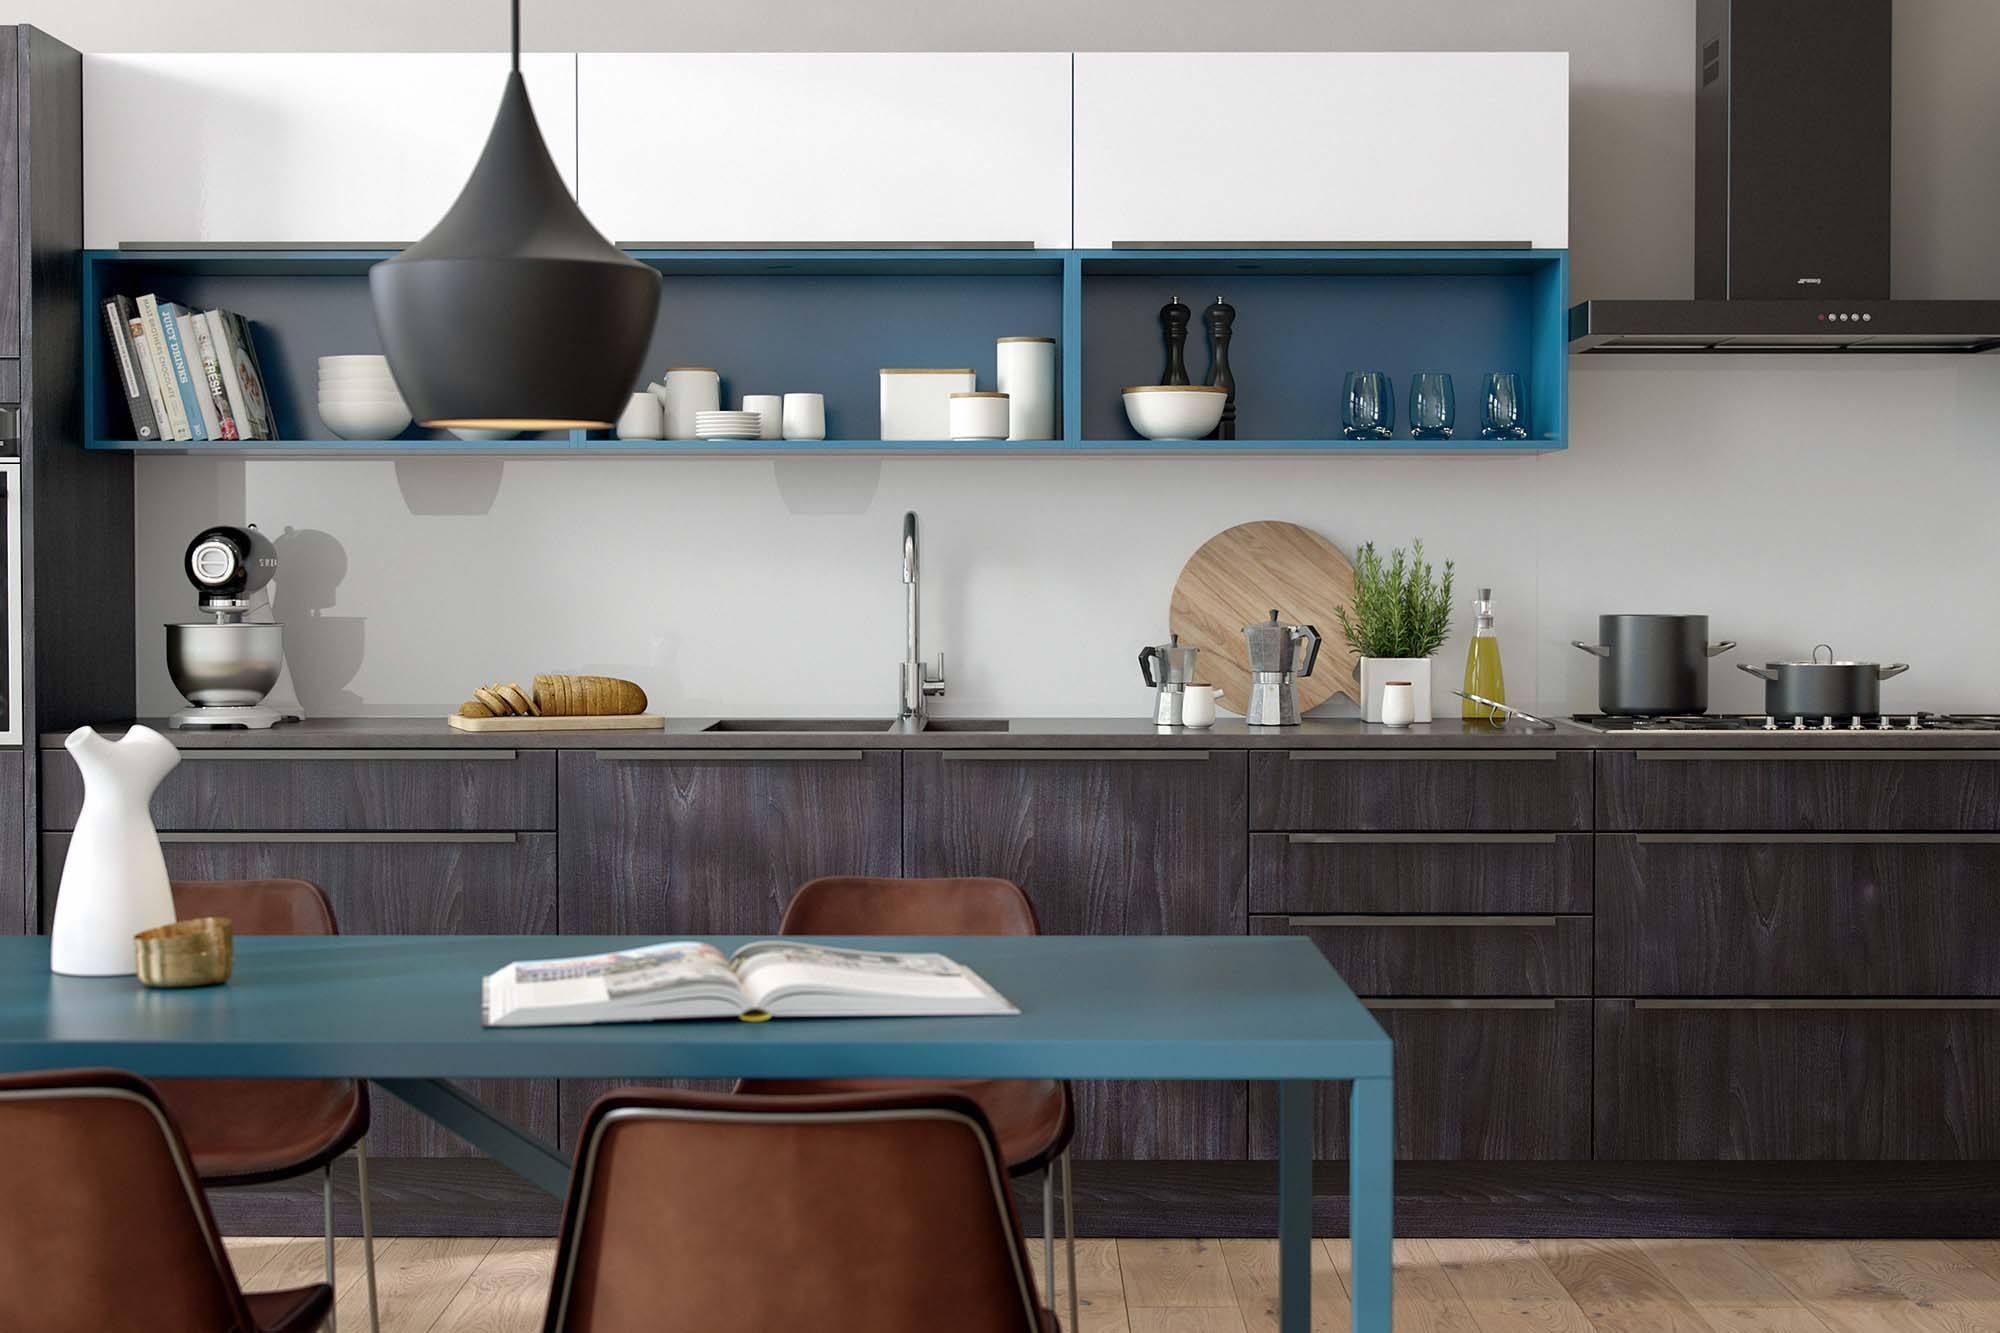 mxv-linear-kitchen-modern-5